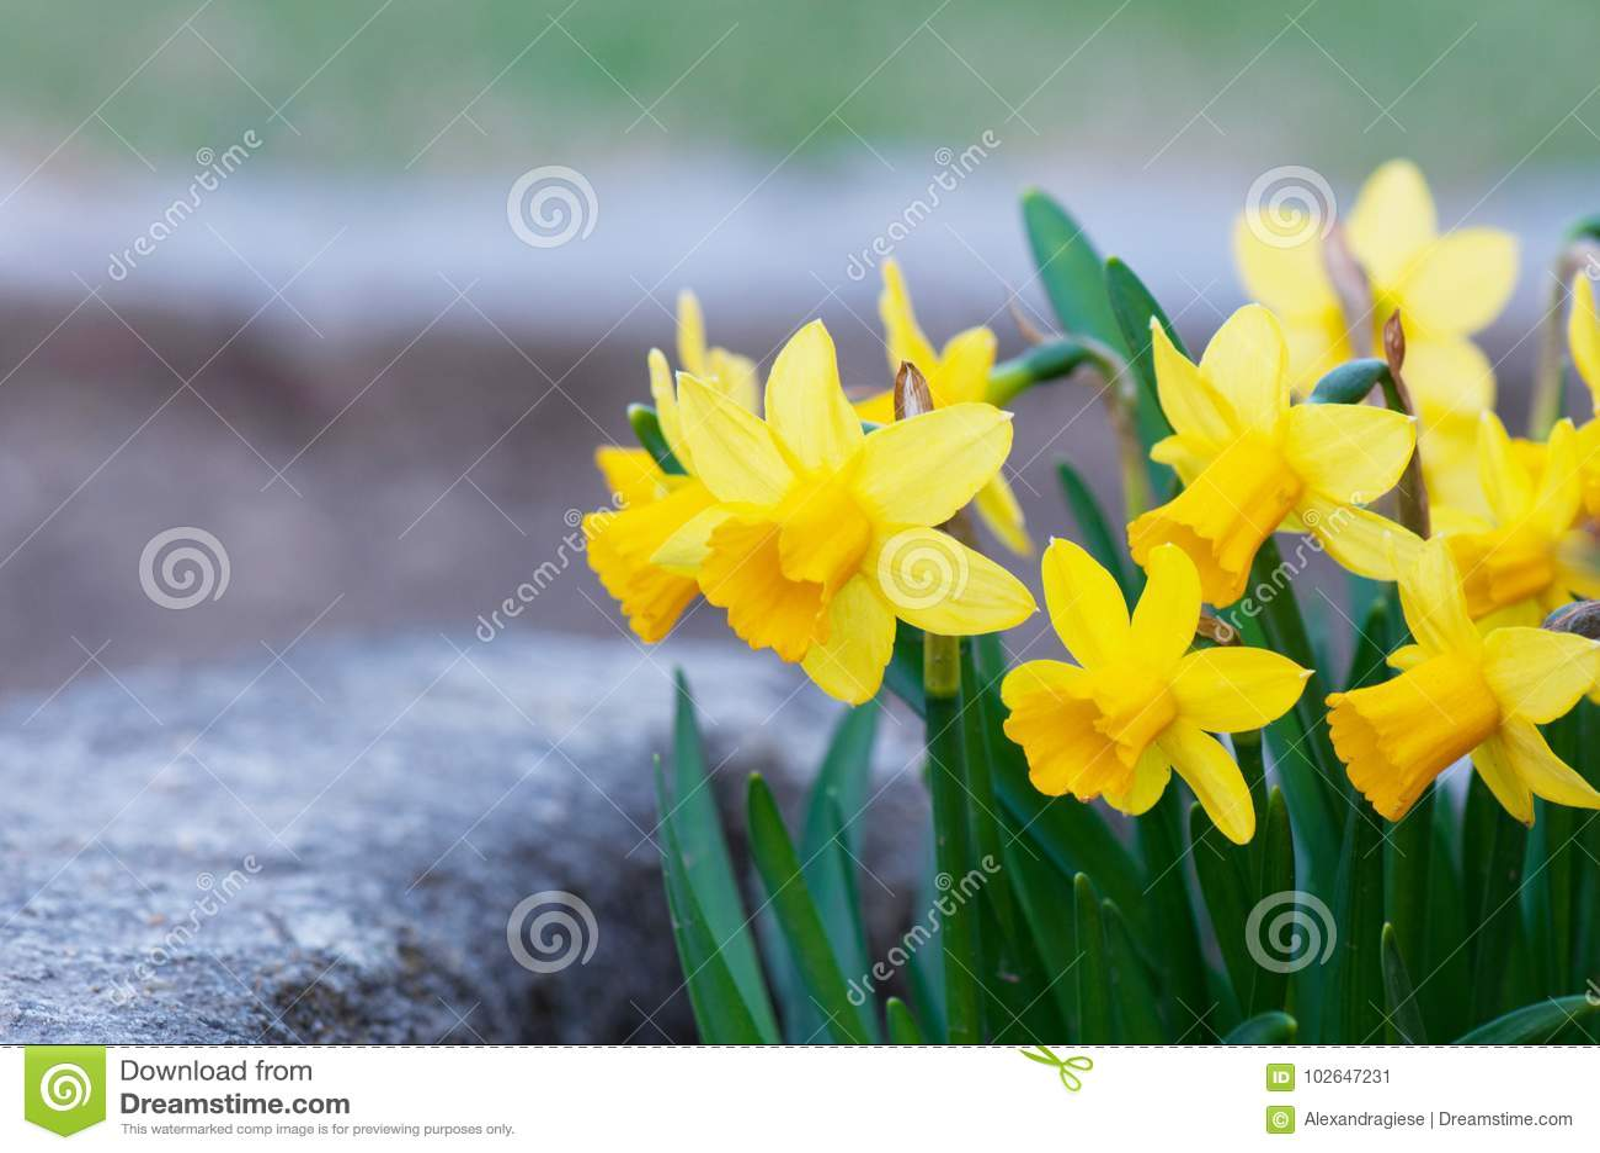 Flowerbed amarelo do narciso